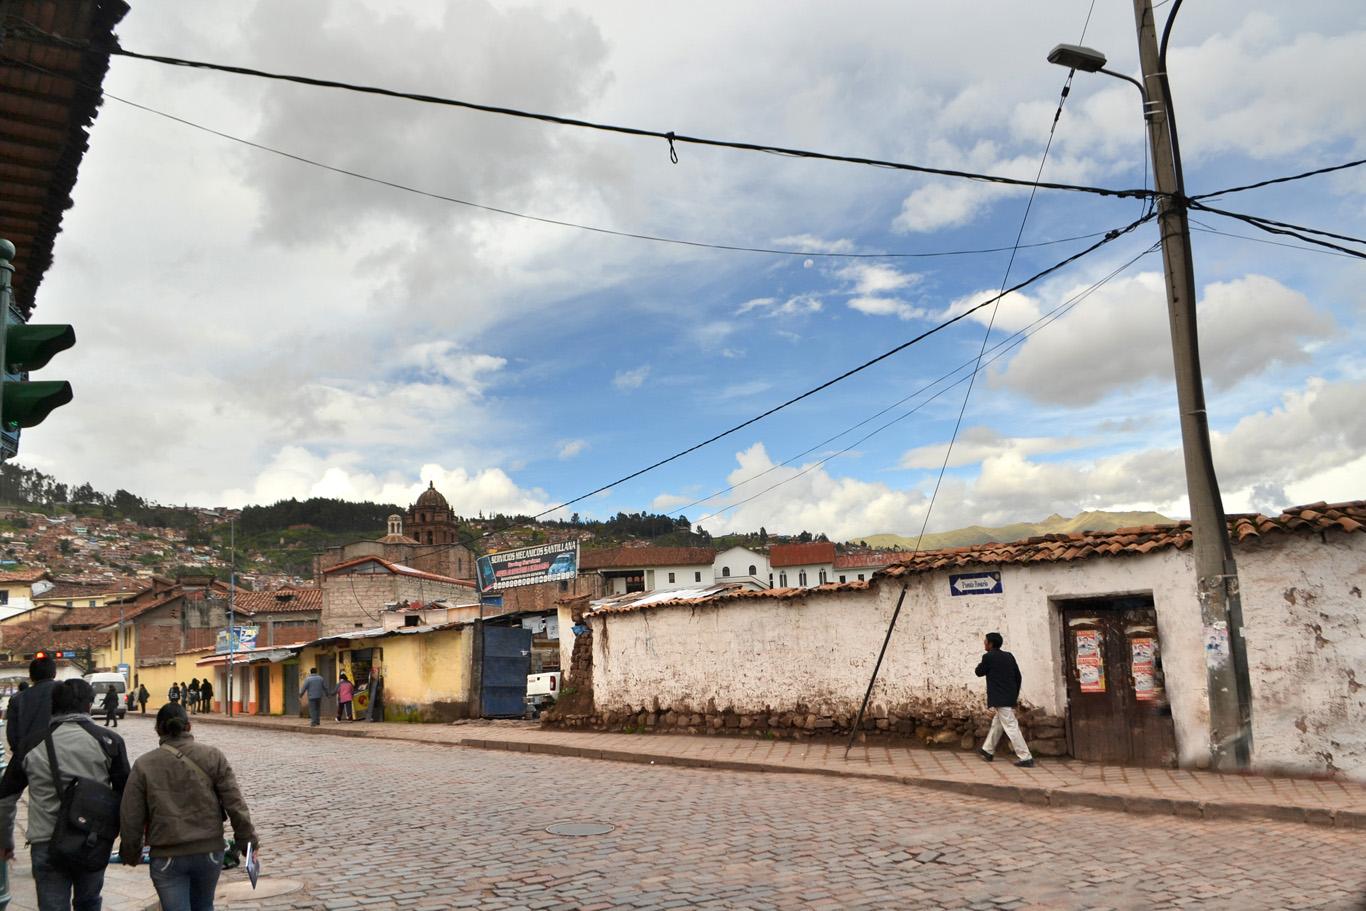 Cuzco - local area